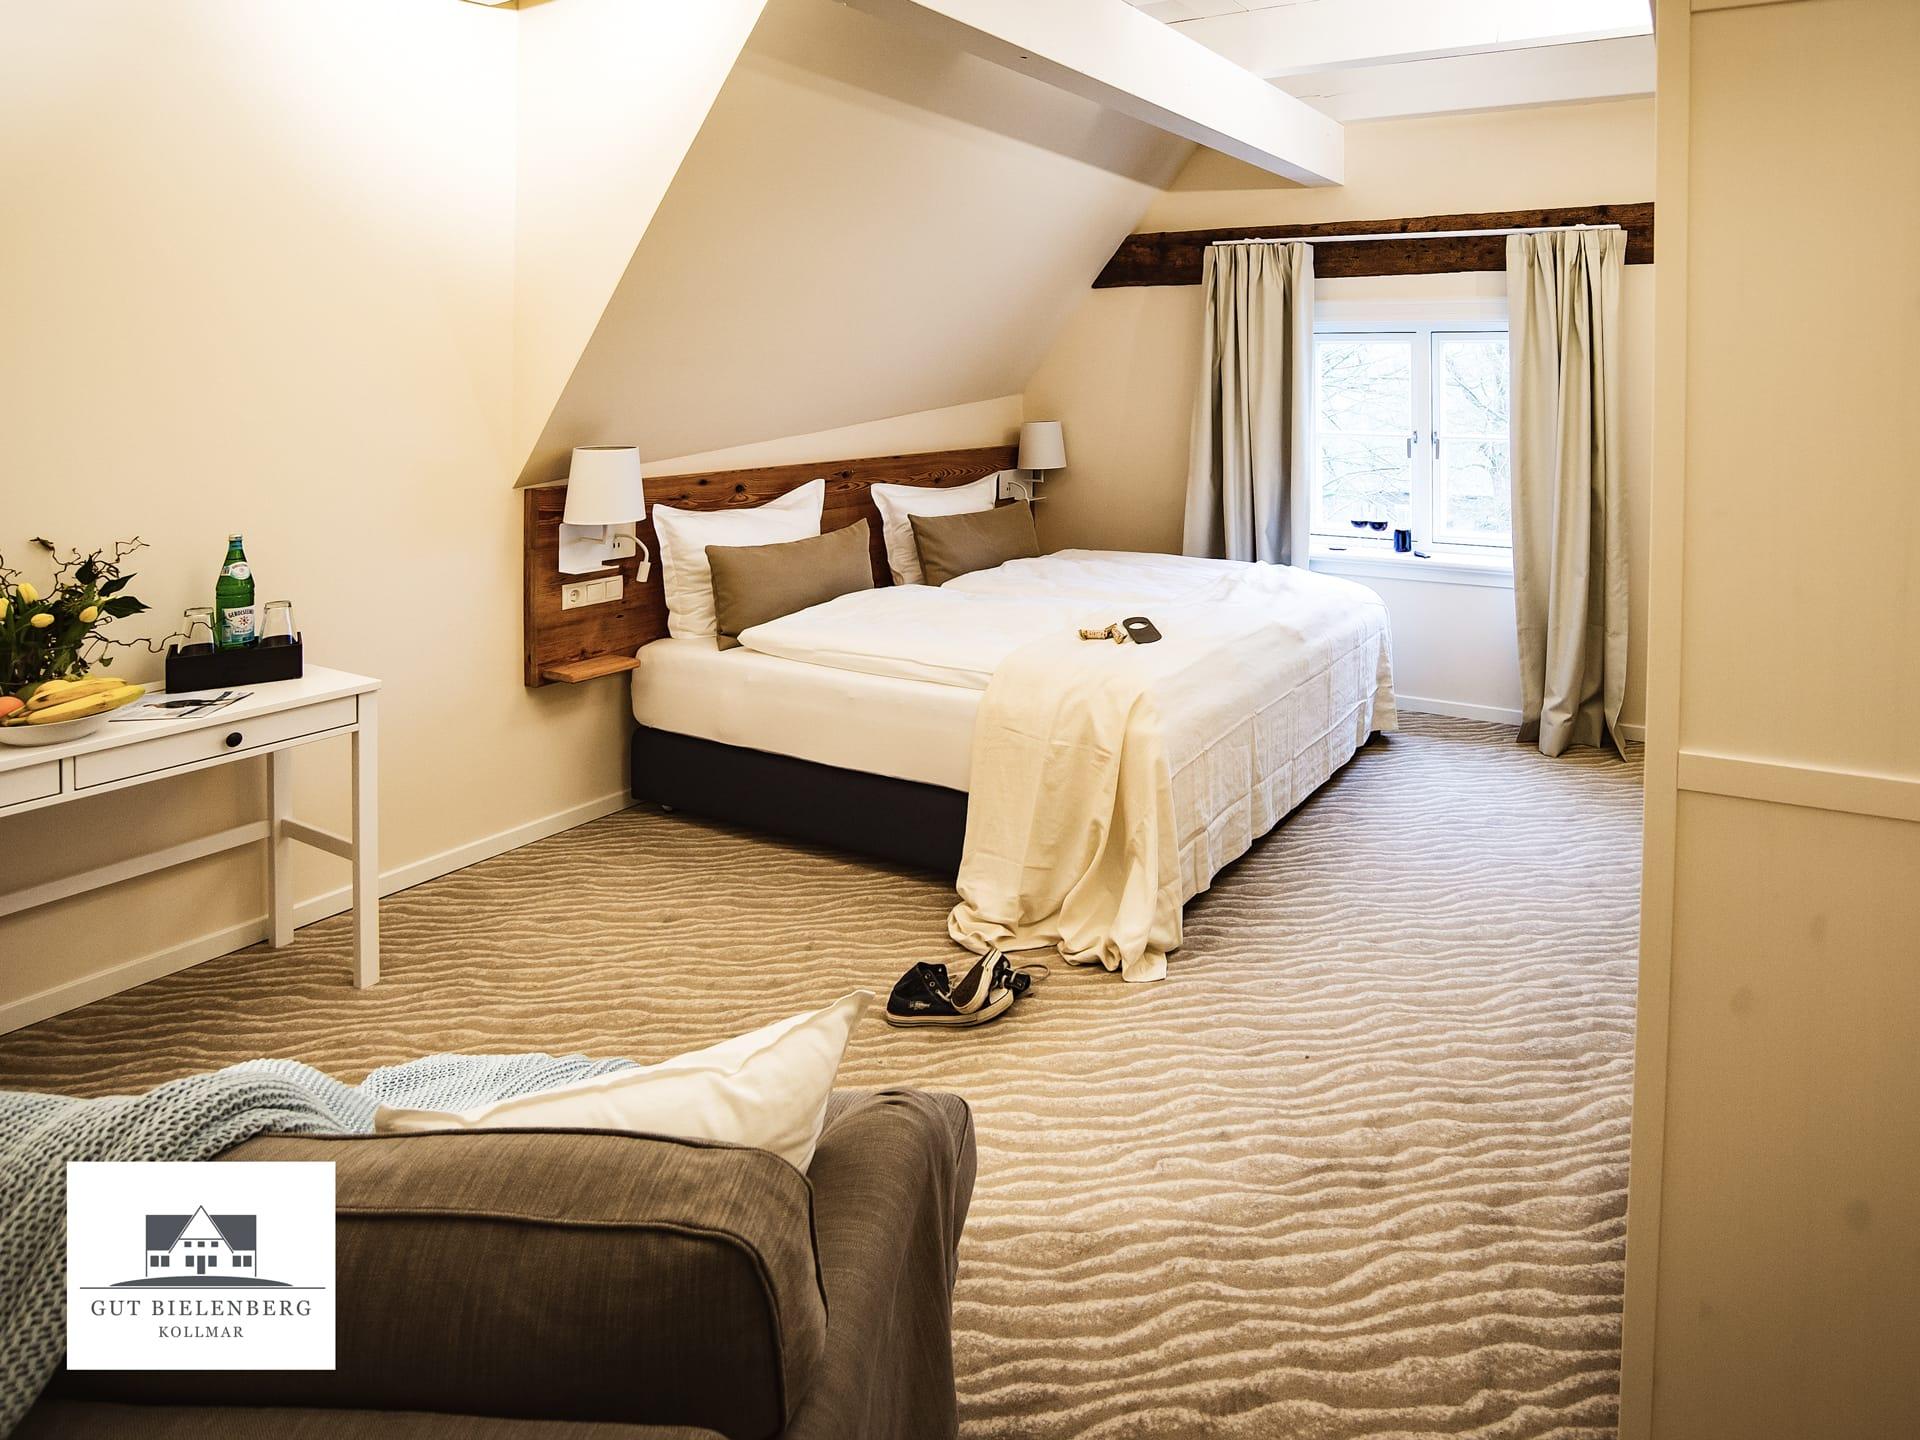 Gut Bielenberg - Suite Talhof